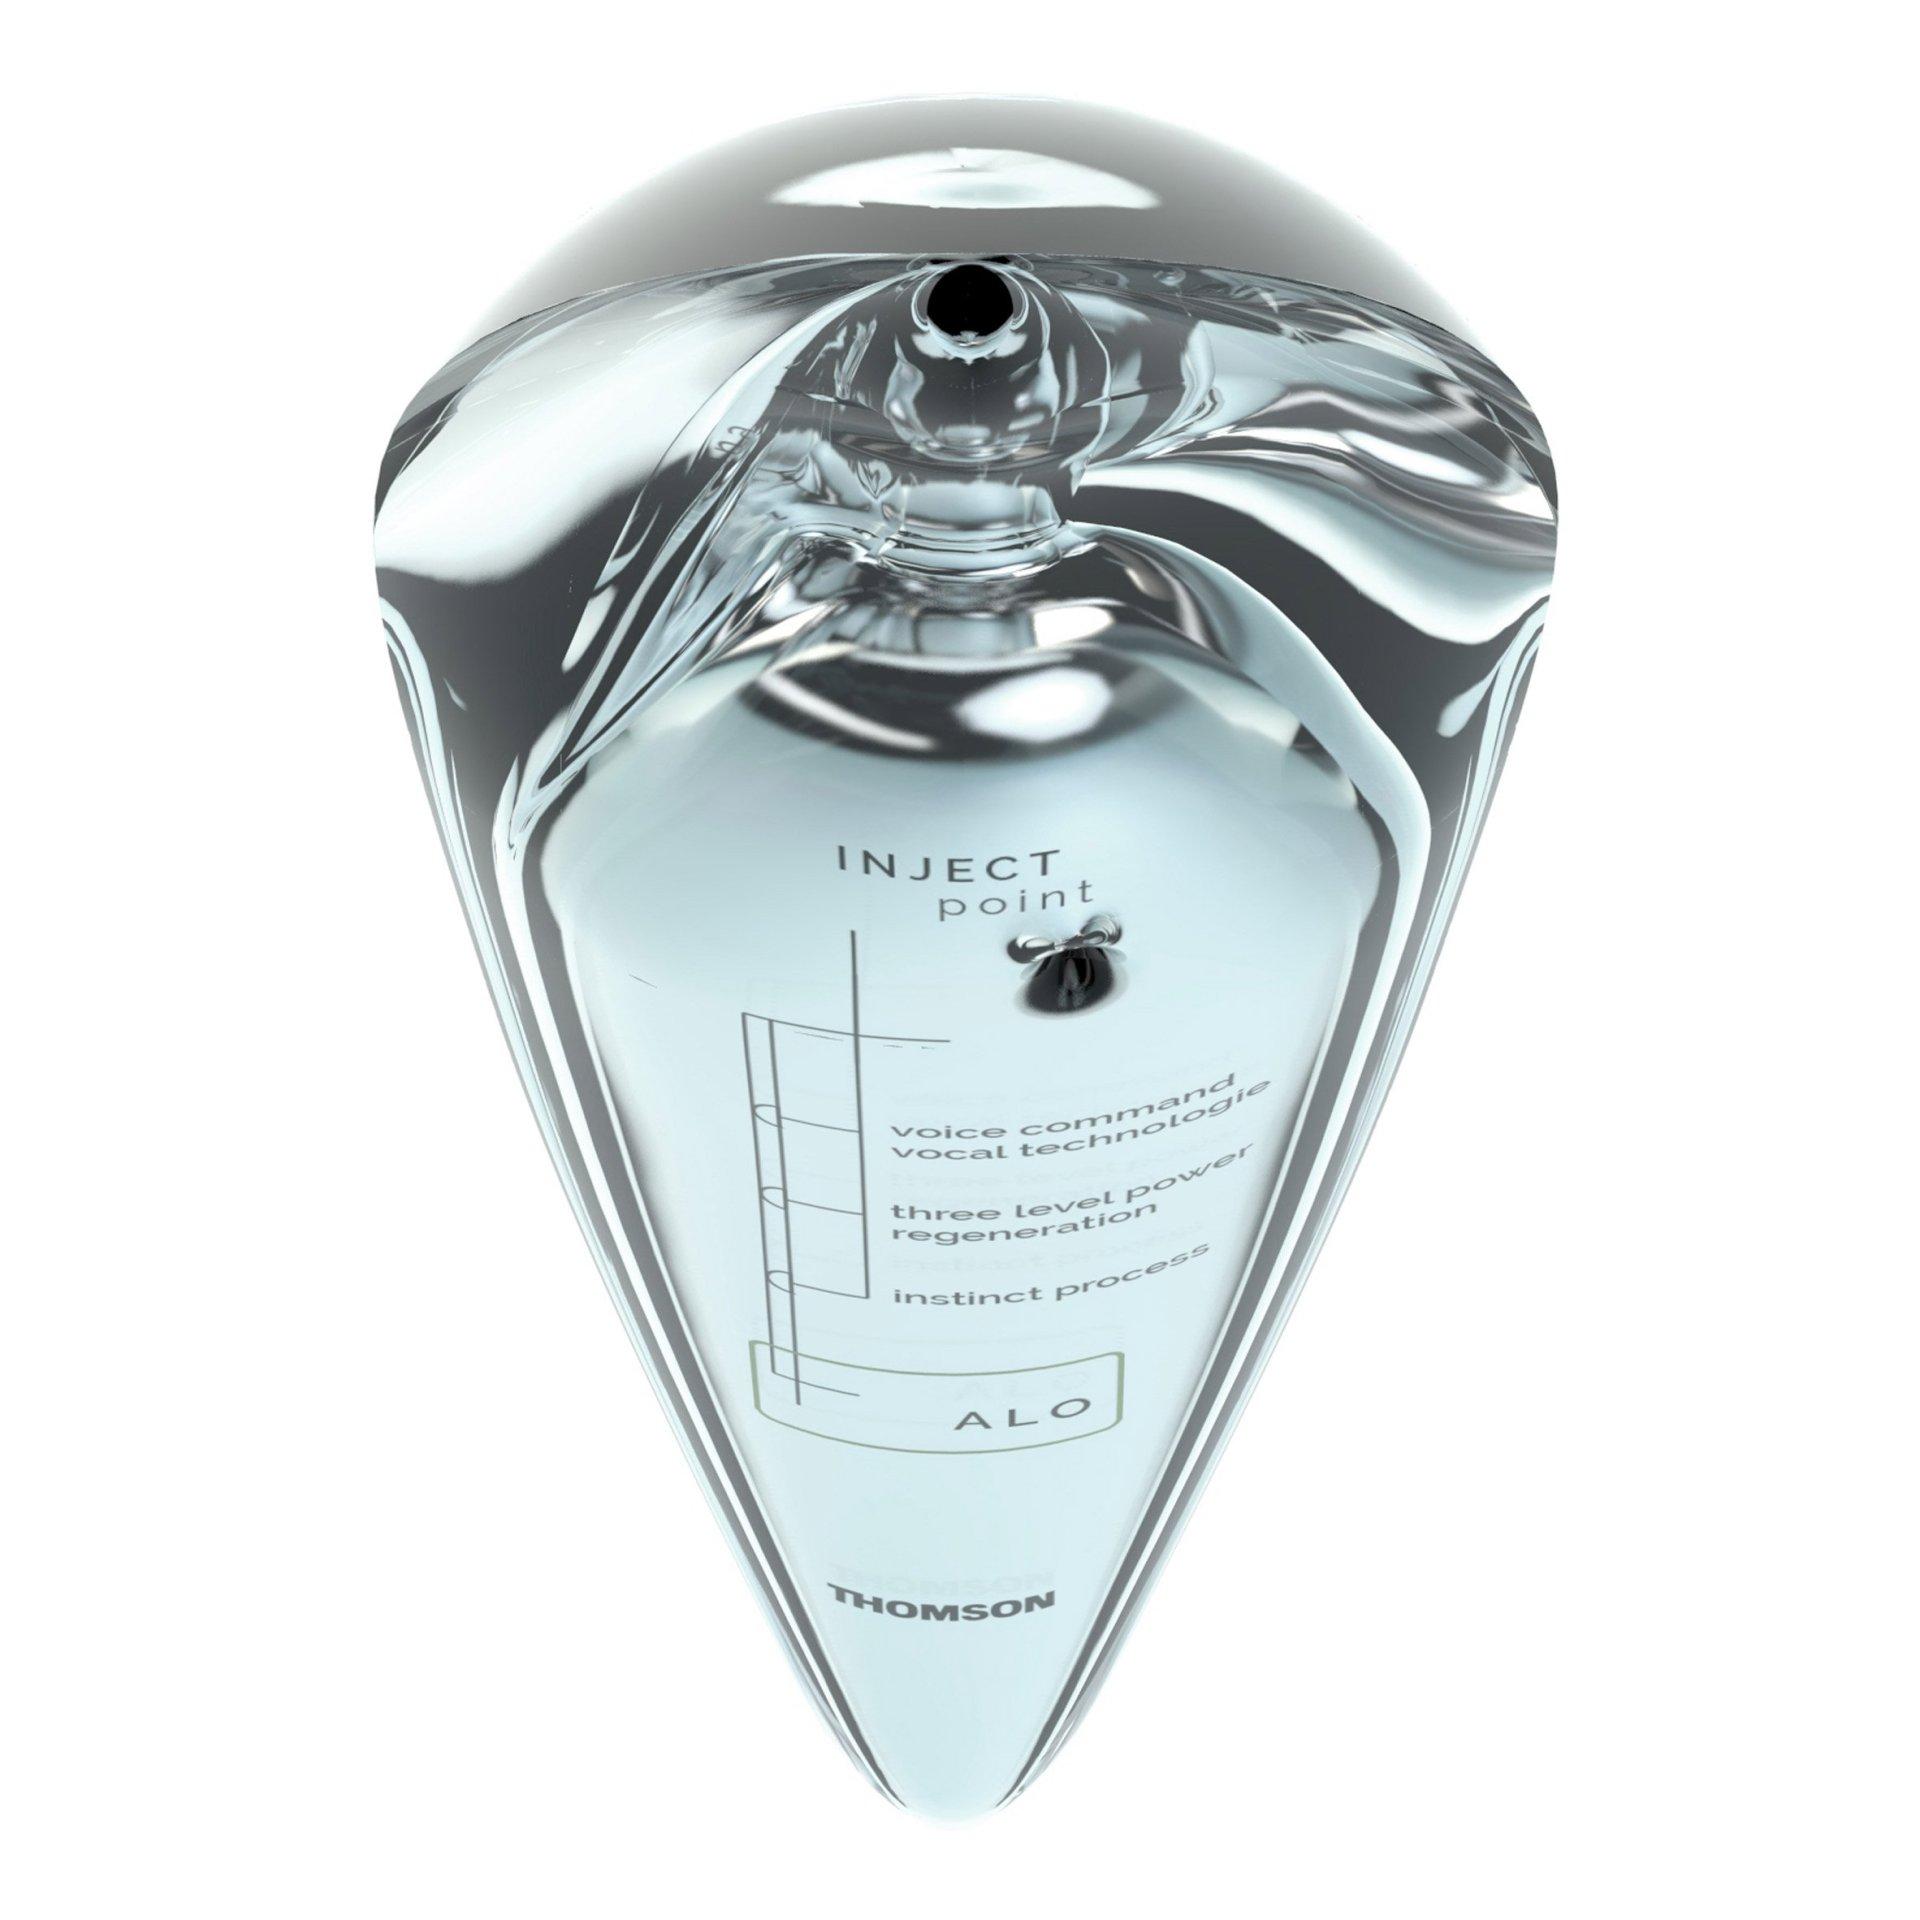 alo-smartphone-design-phone-technology-philippe-starck-jerome-olivet_dezeen_2364_col_6